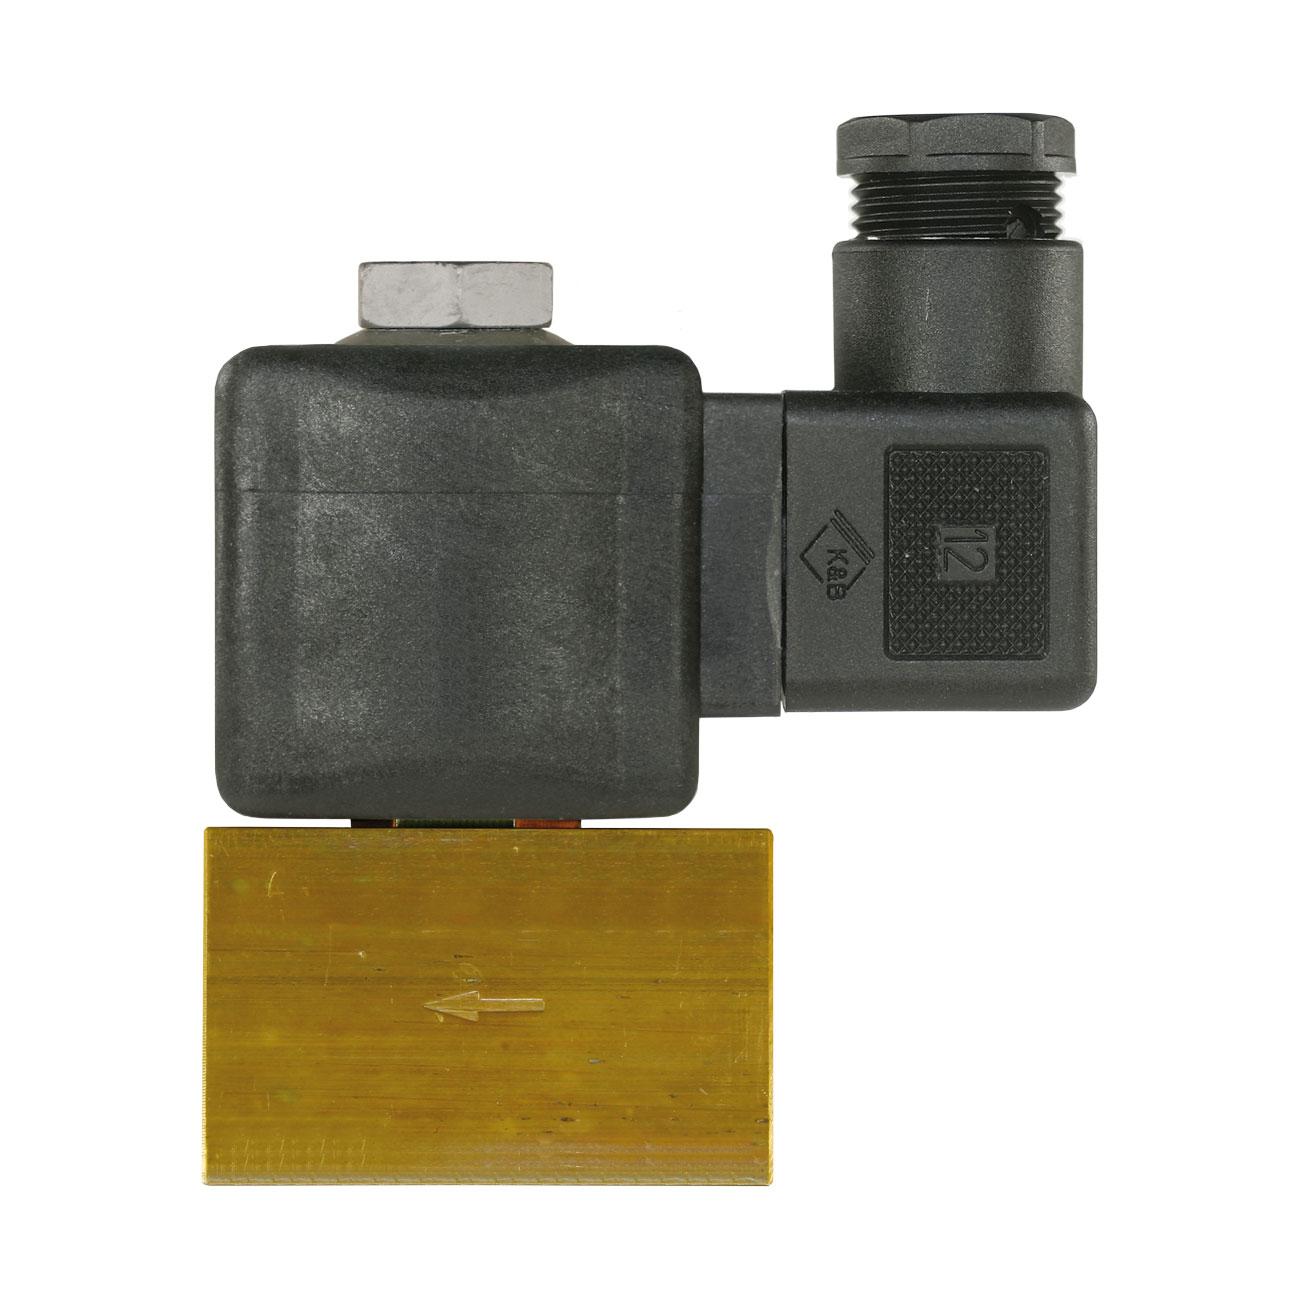 ELECTROVANNE RAPA 1/4 24V= SV04 R 1.5